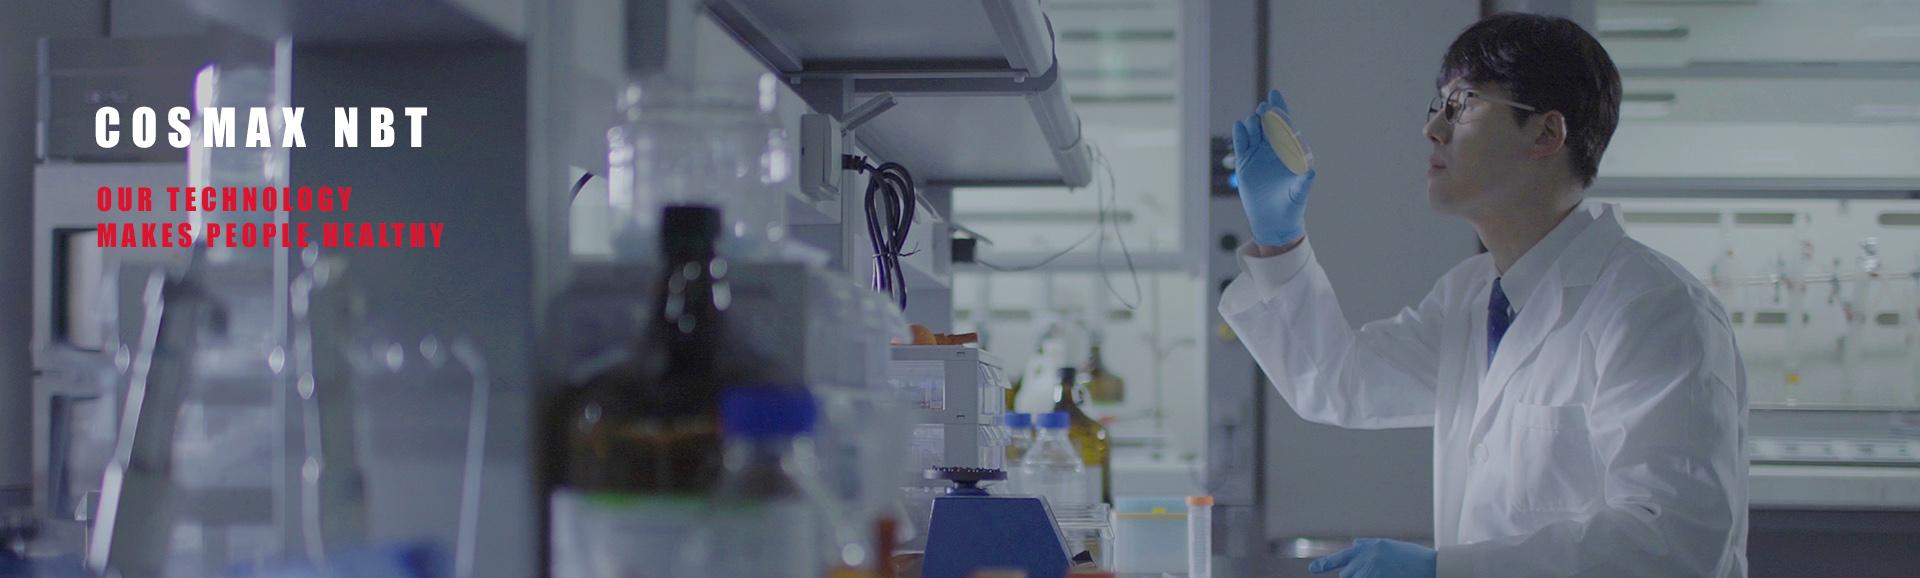 COSMAX NBT, INC  South Korea Manufacturers, suppliers